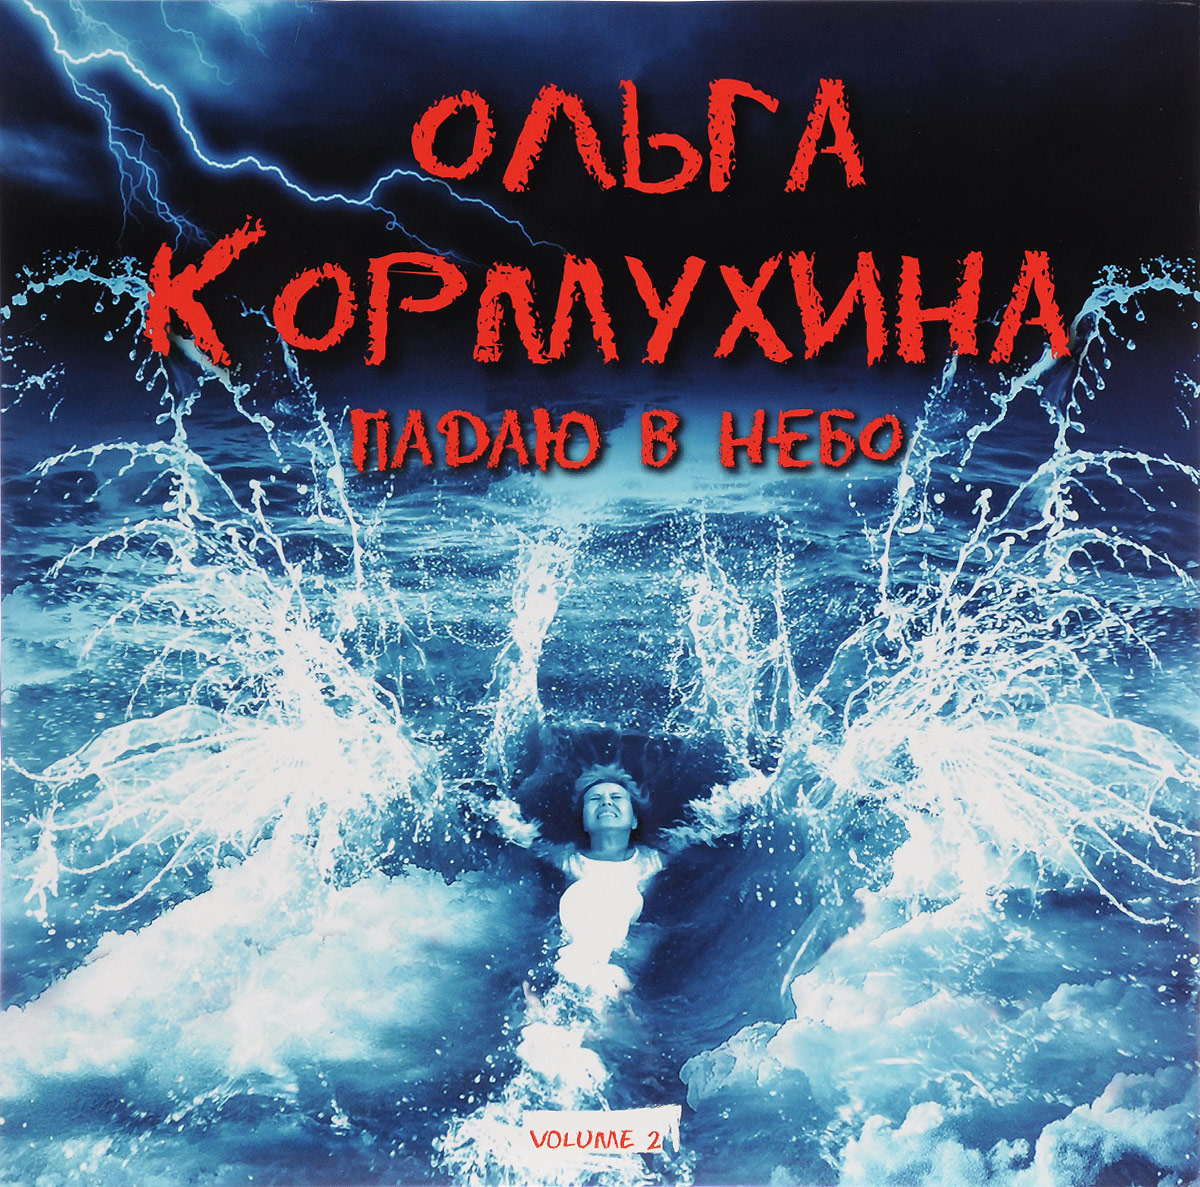 Ольга Кормухина Ольга Кормухина. Падаю в небо. Volume 2 (LP)